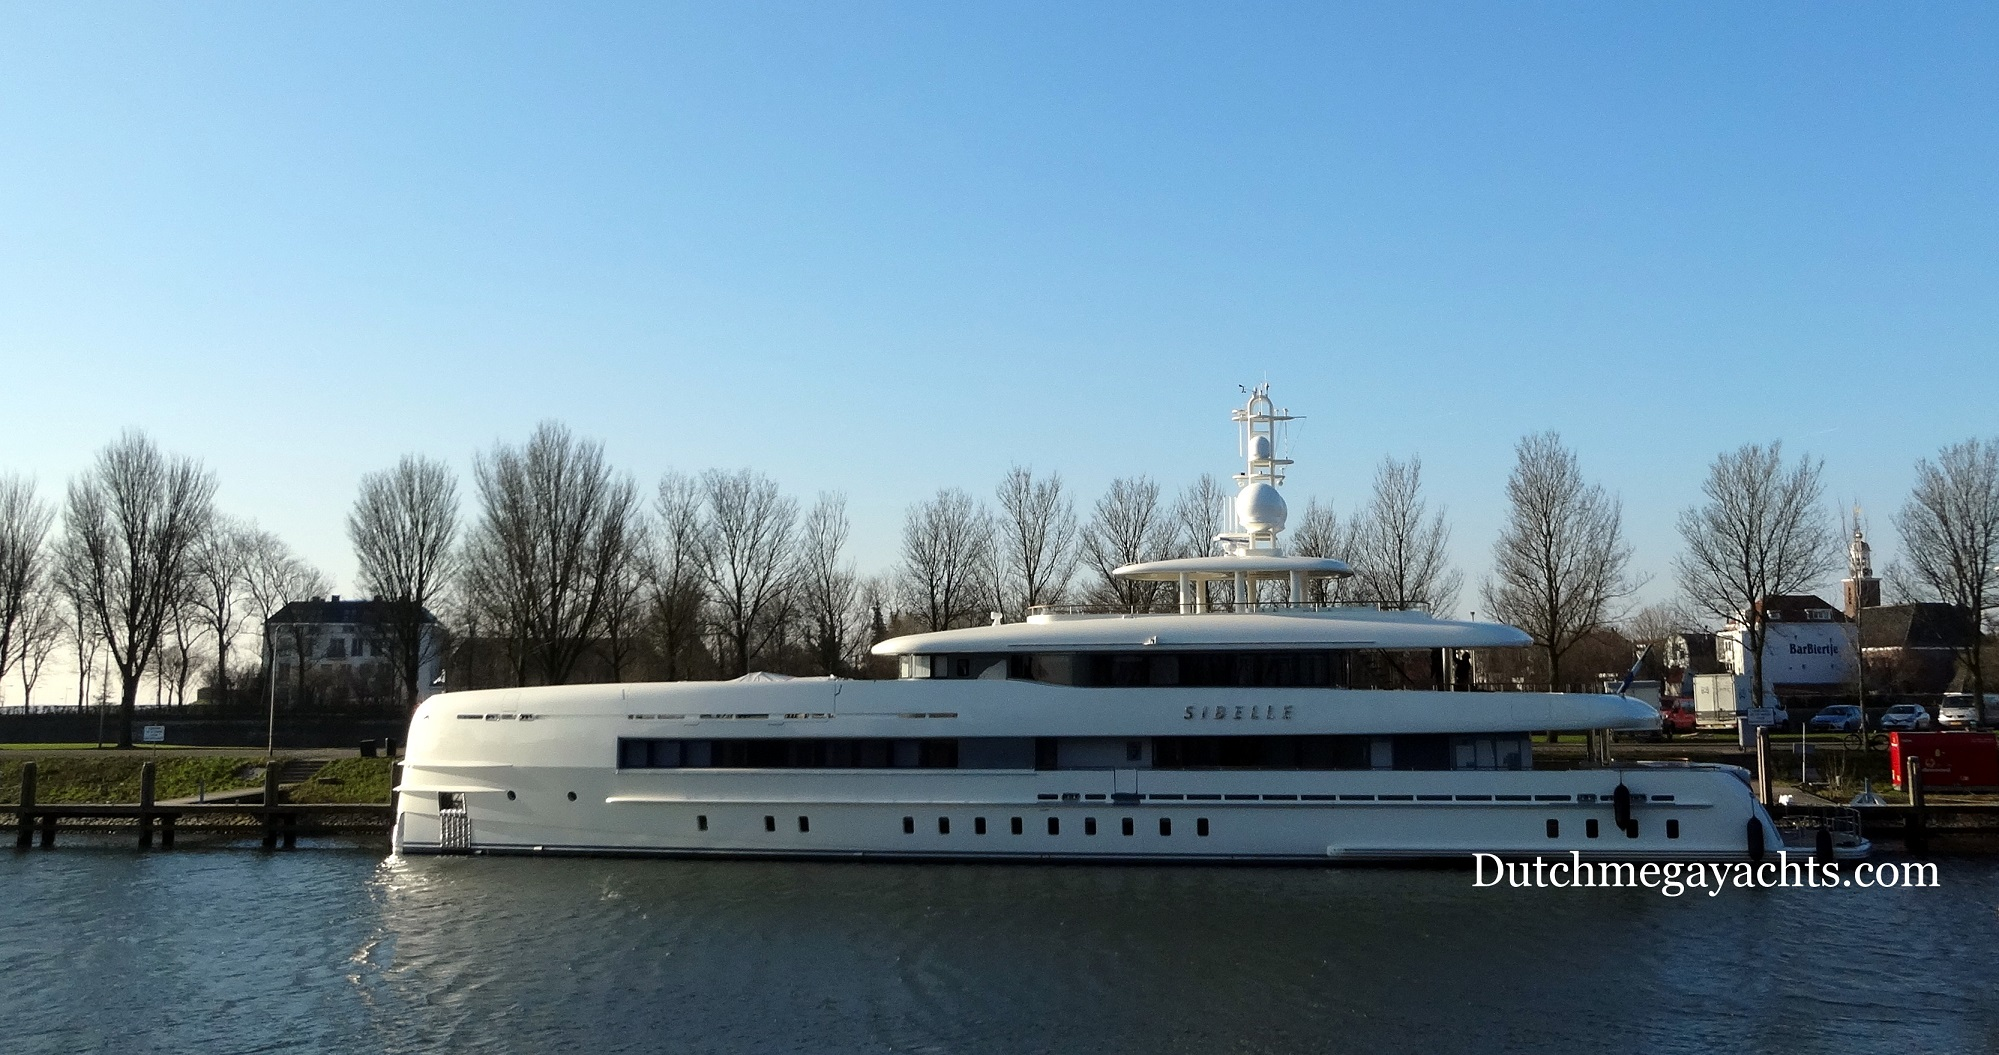 Luxury motor yacht SIBELLE